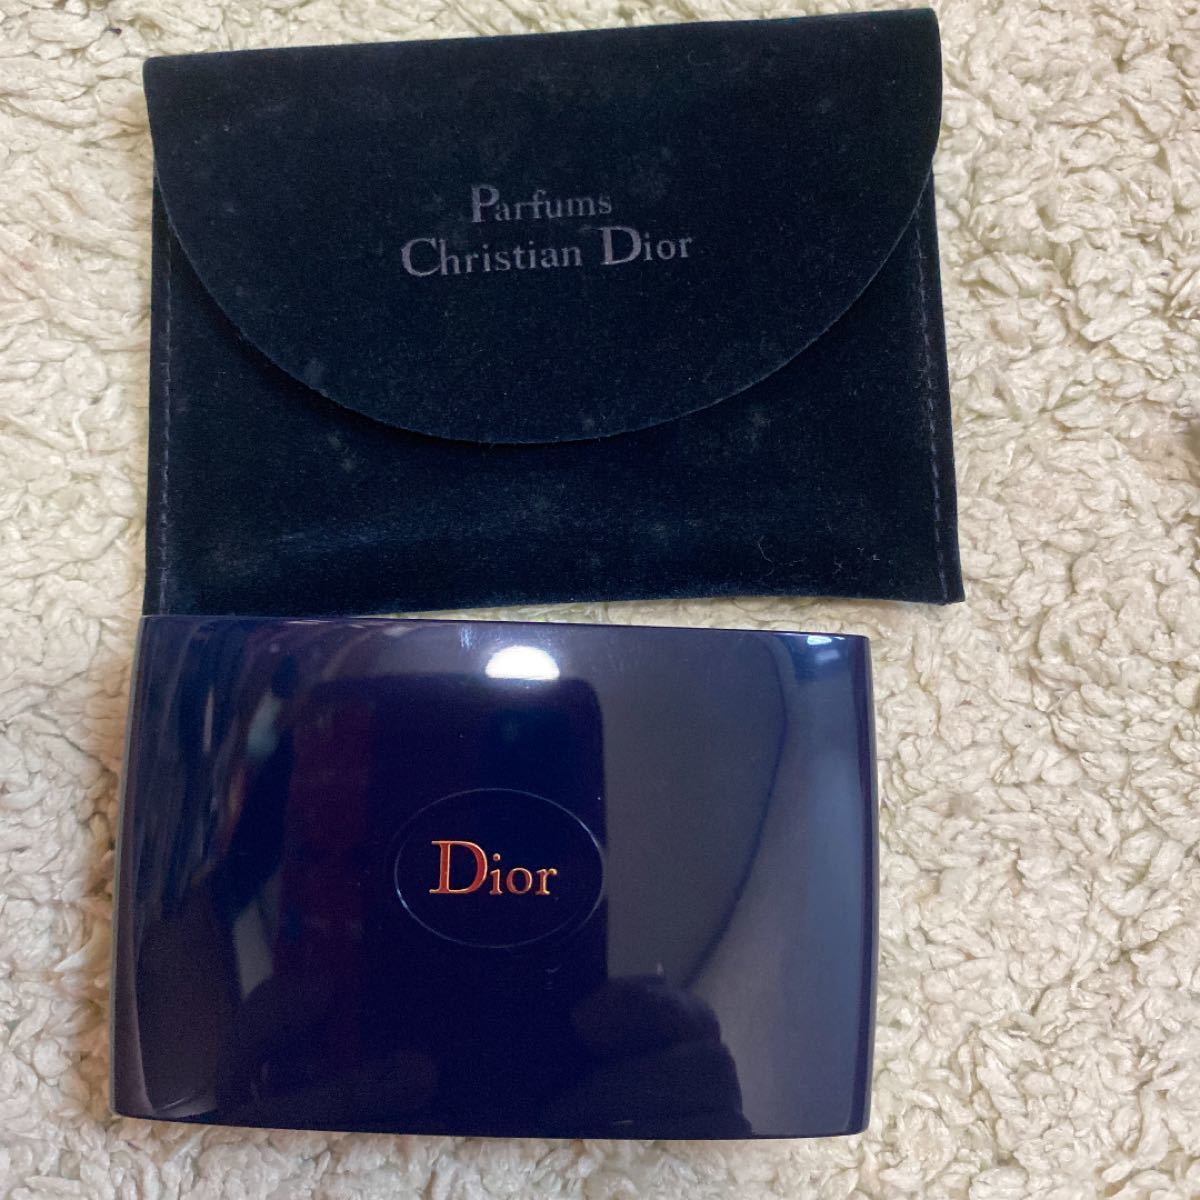 Dior ディオール メイクパレット ミニサイズ アイシャドウ ルージュ ピンク